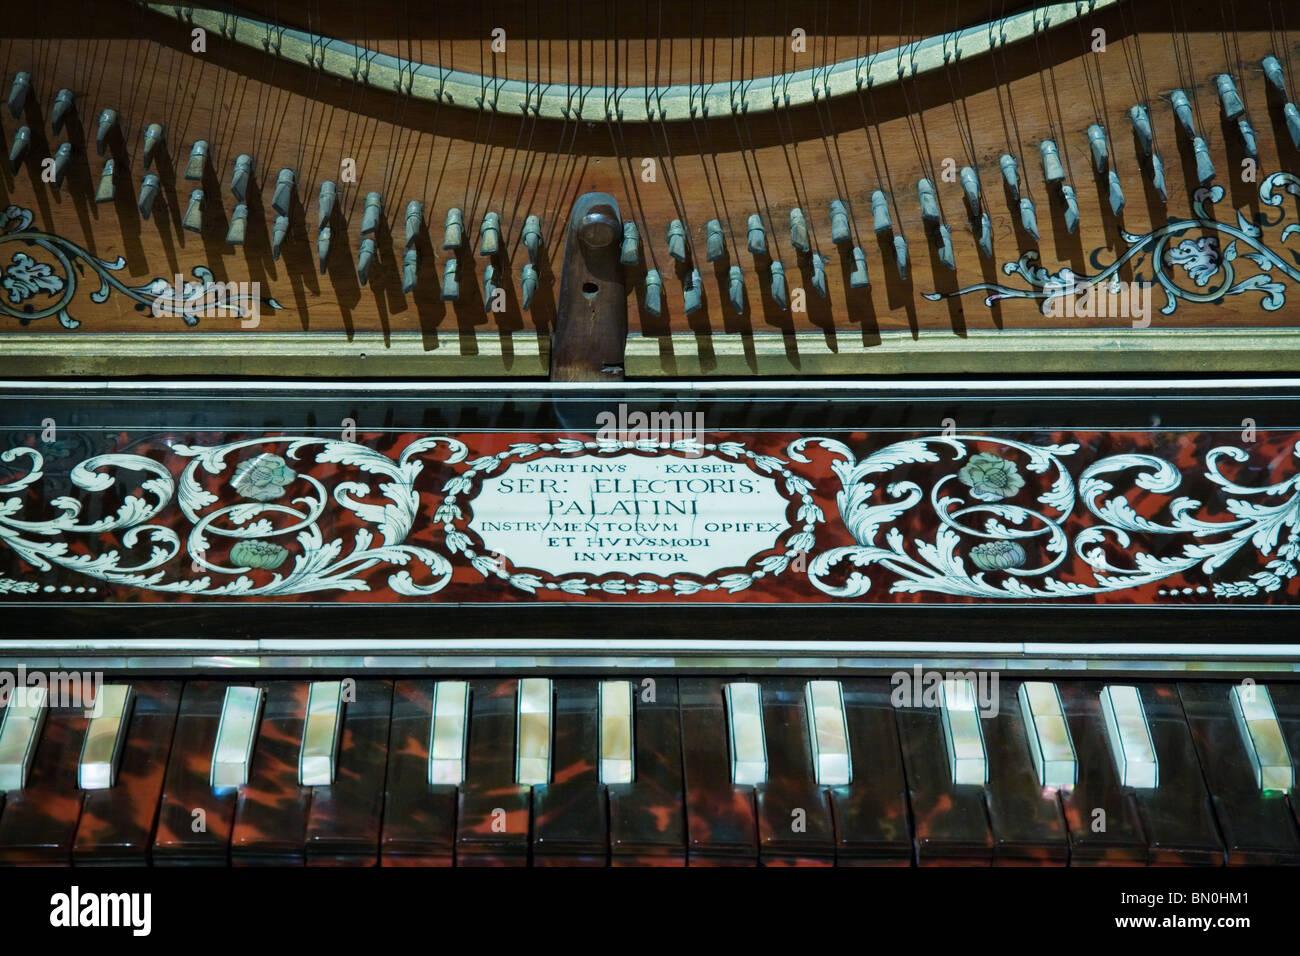 Baroque Clavichord keyboard - Stock Image